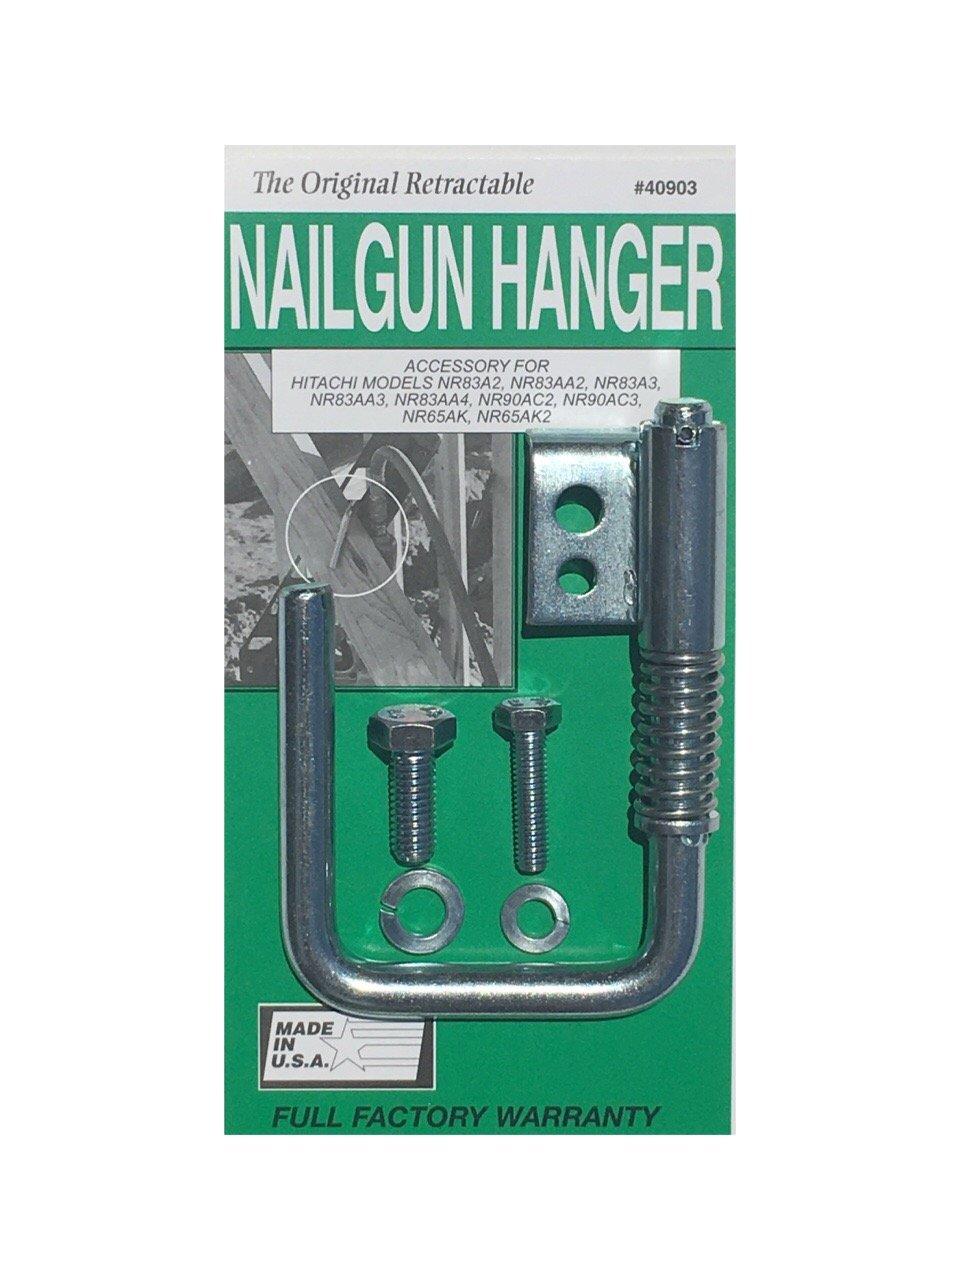 Toolhangers Unlimited Original Nail Gun Hanger (Green #40903)